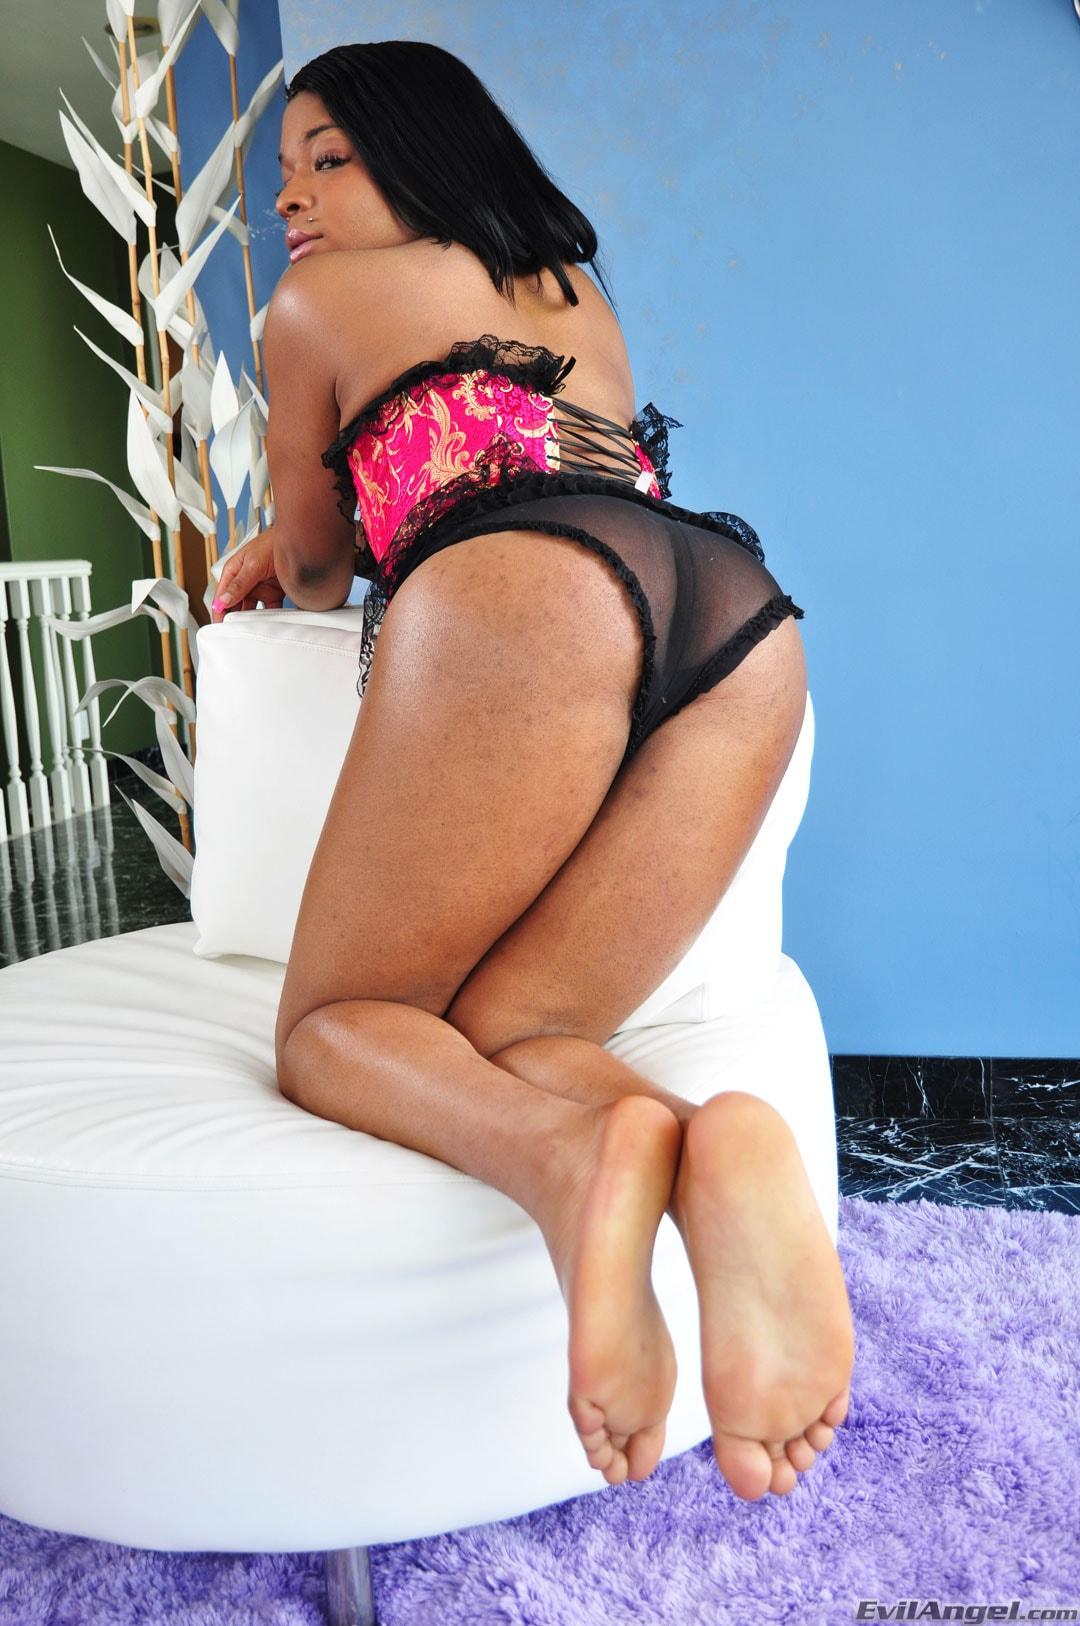 I Love Black Shemales 'Black Shemale Idol - The Auditions' starring Lola Bonnie (Photo 1)